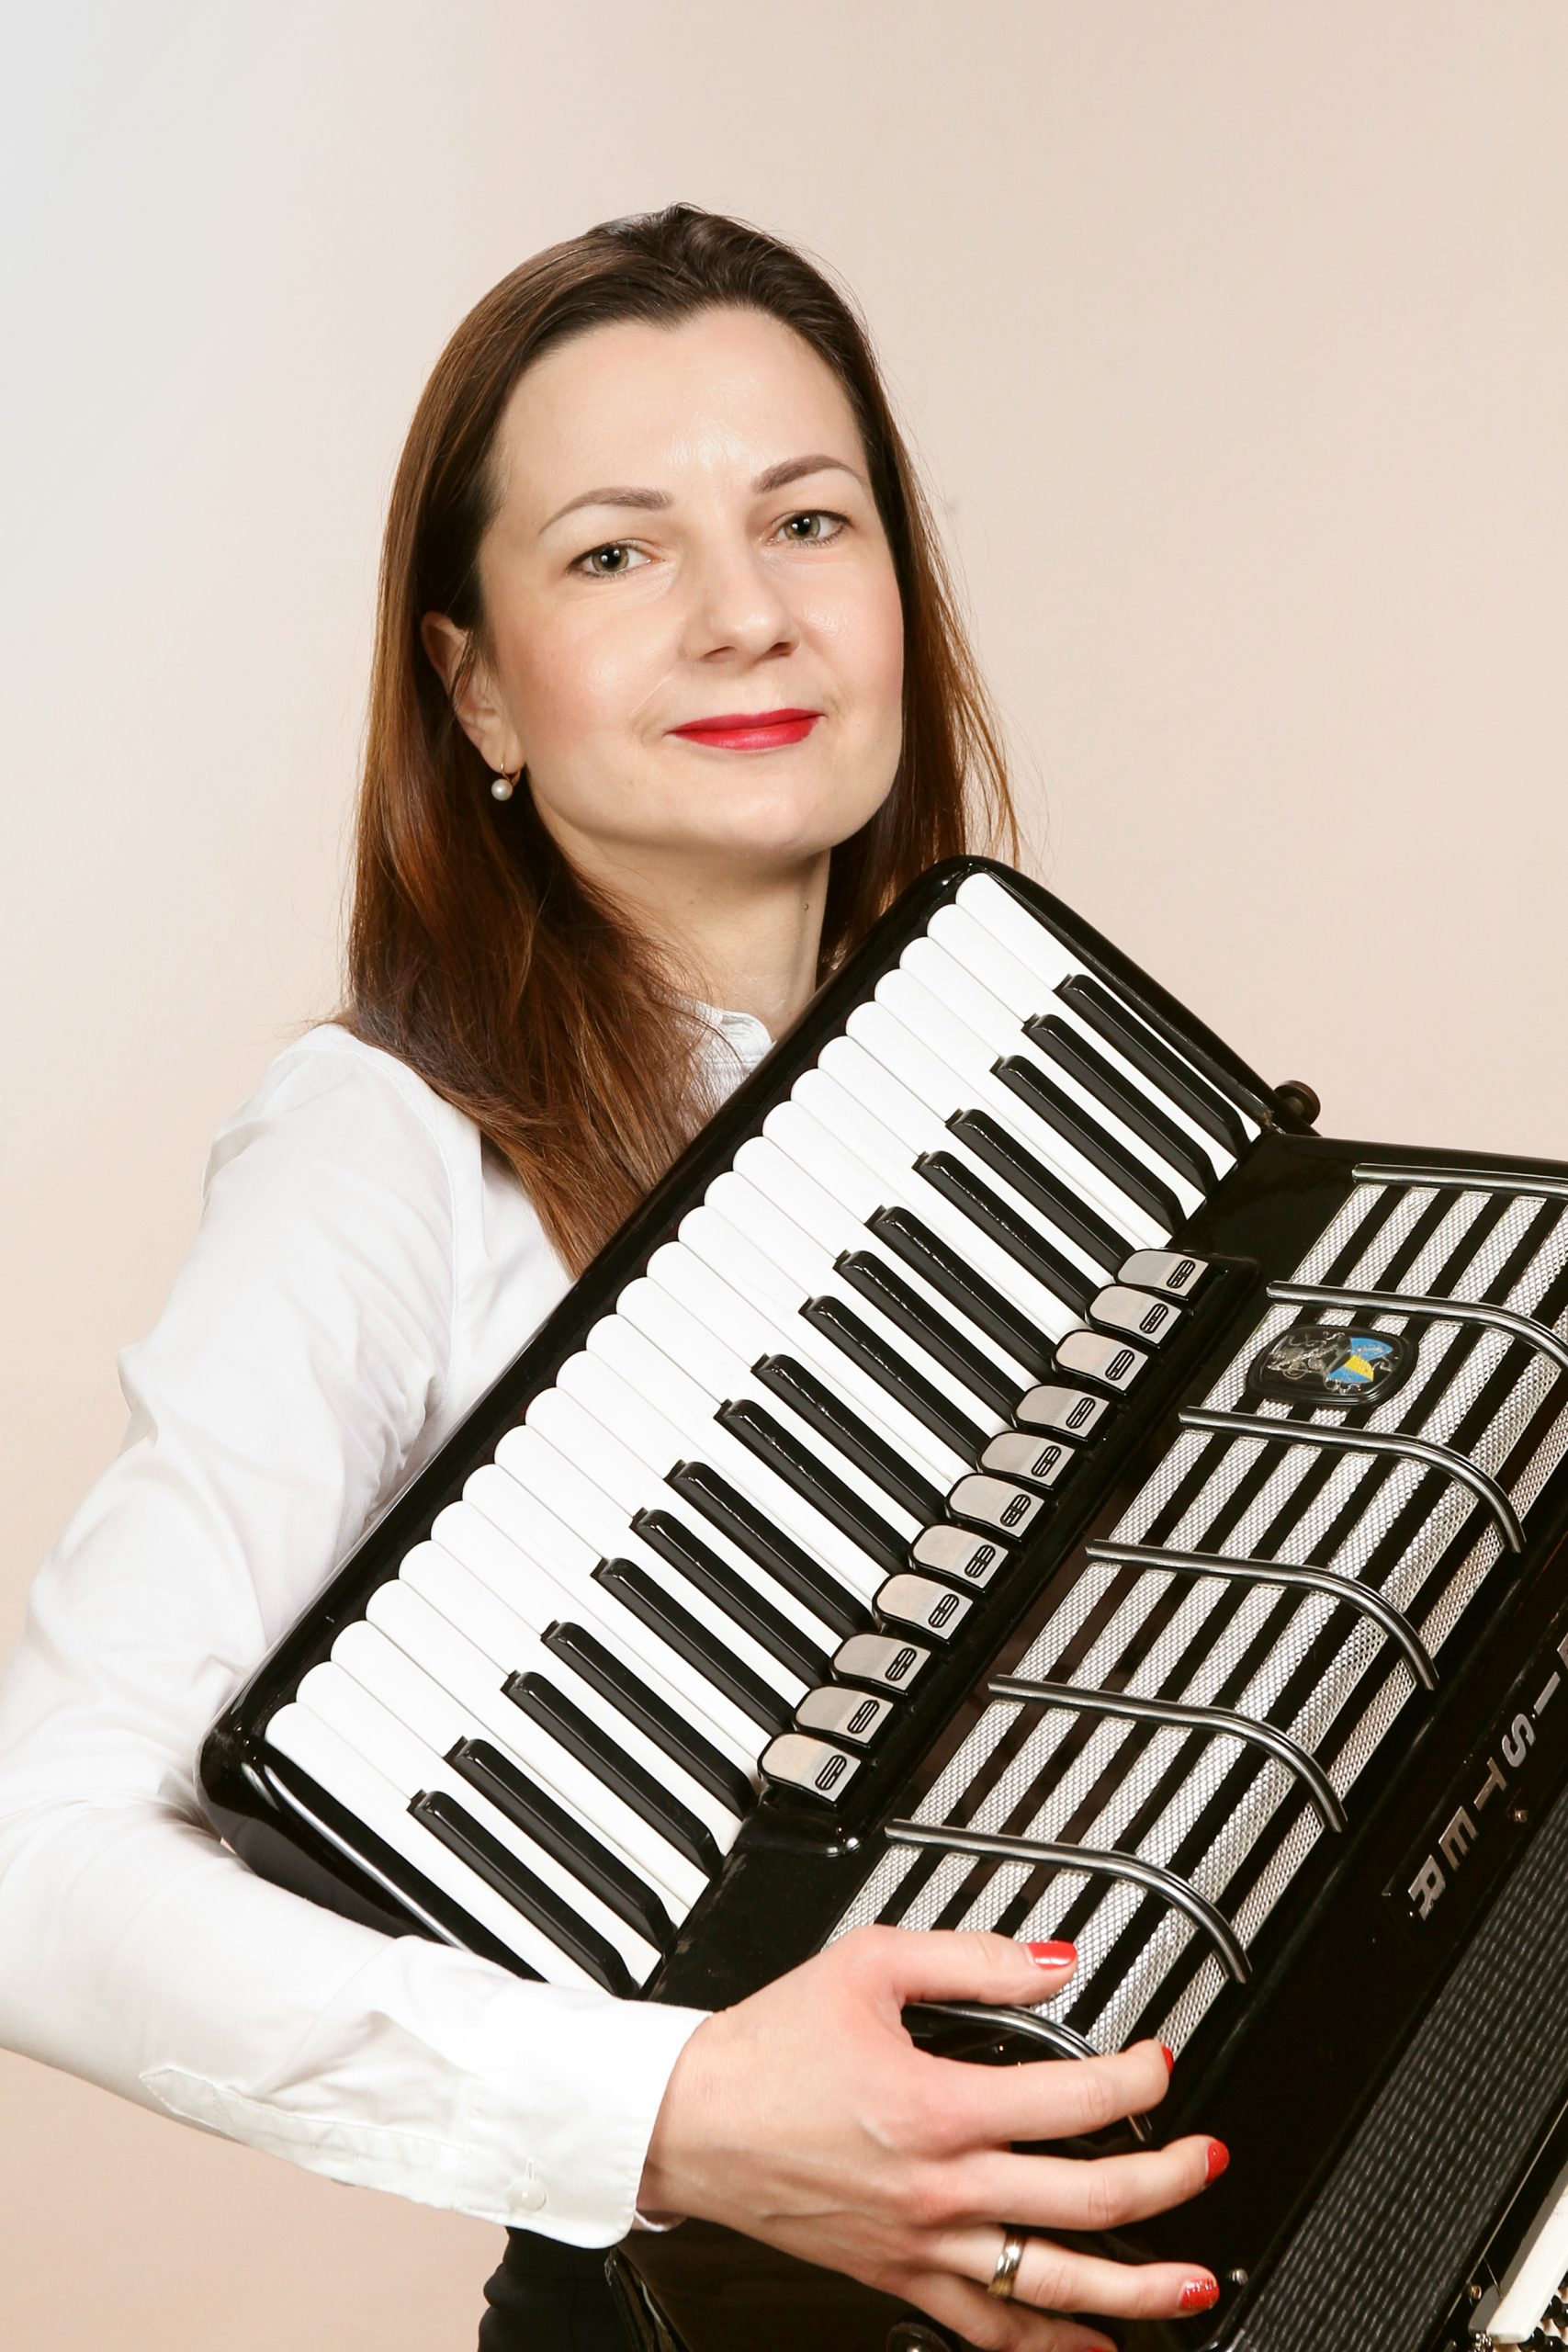 Viktorija Kirilova